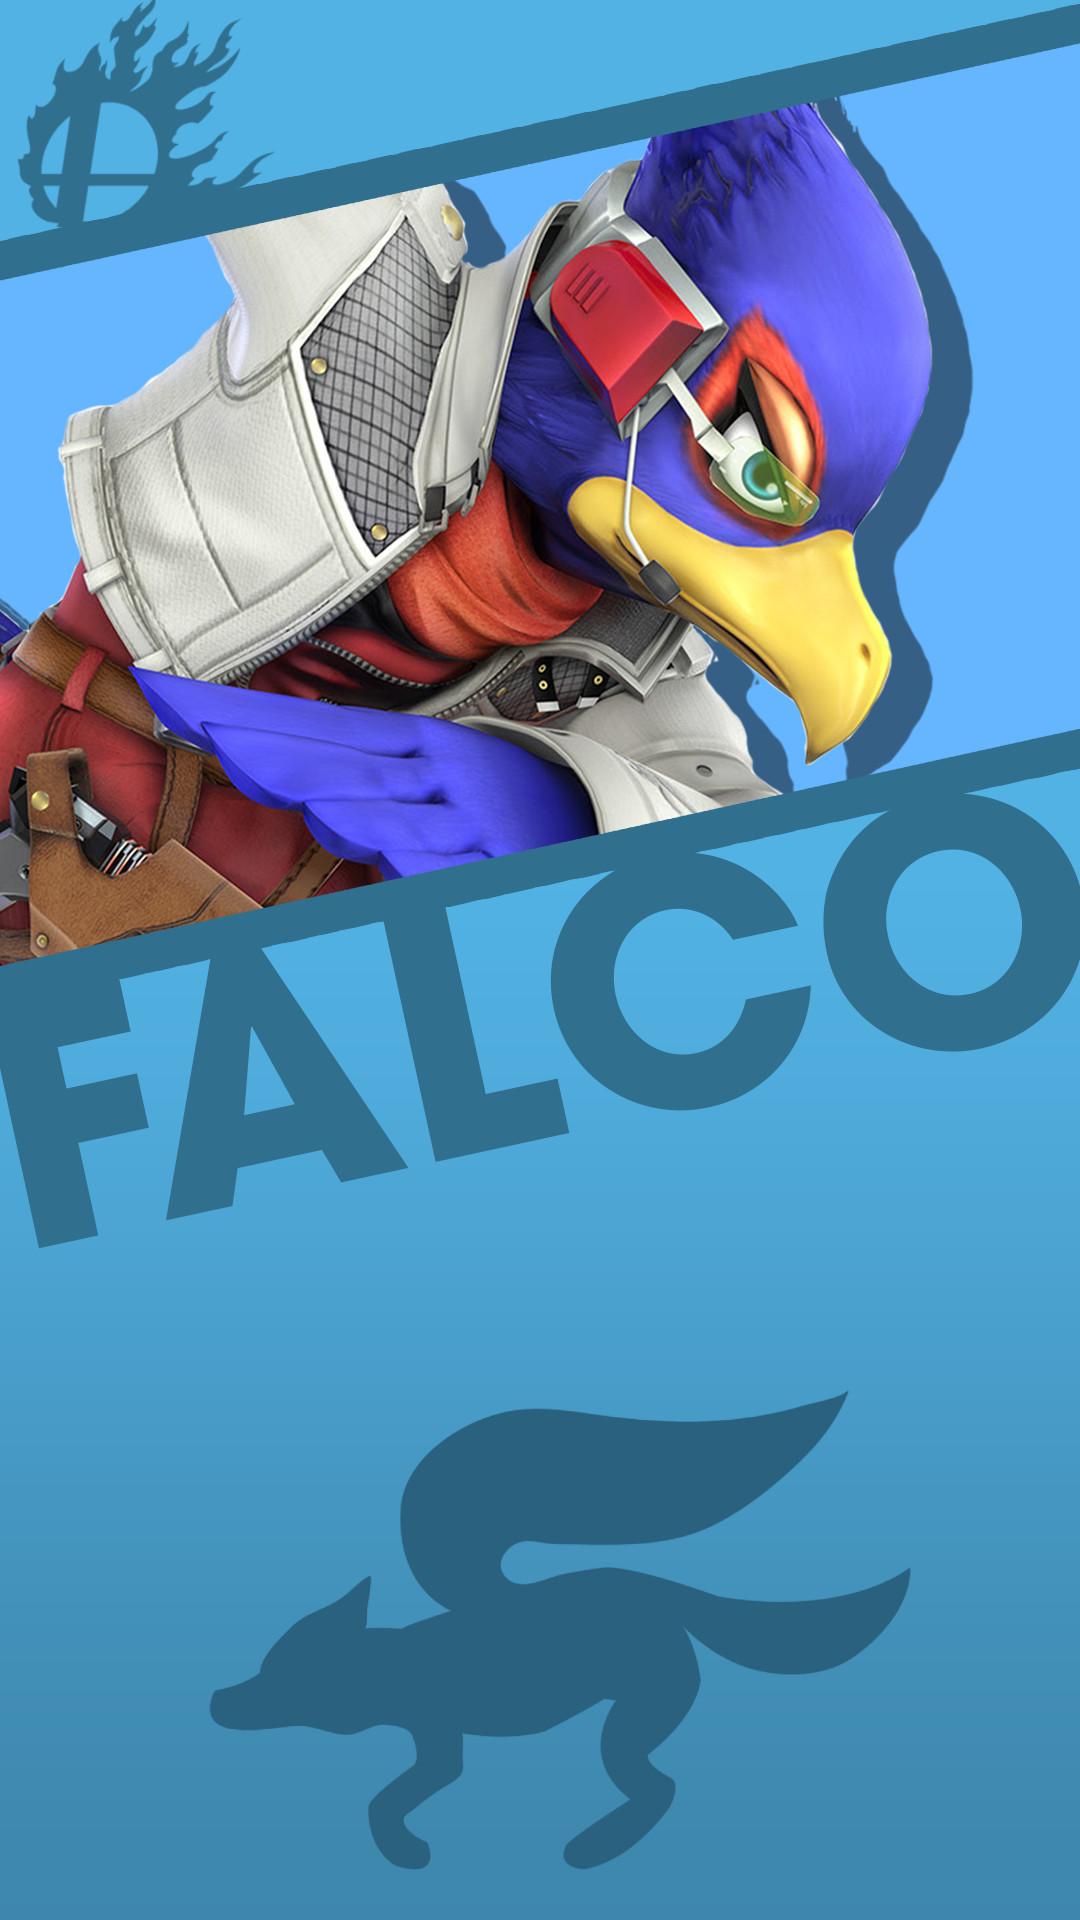 Phone Wallpaper By Mrthatkidalex24 Falco Smash Bros Falco